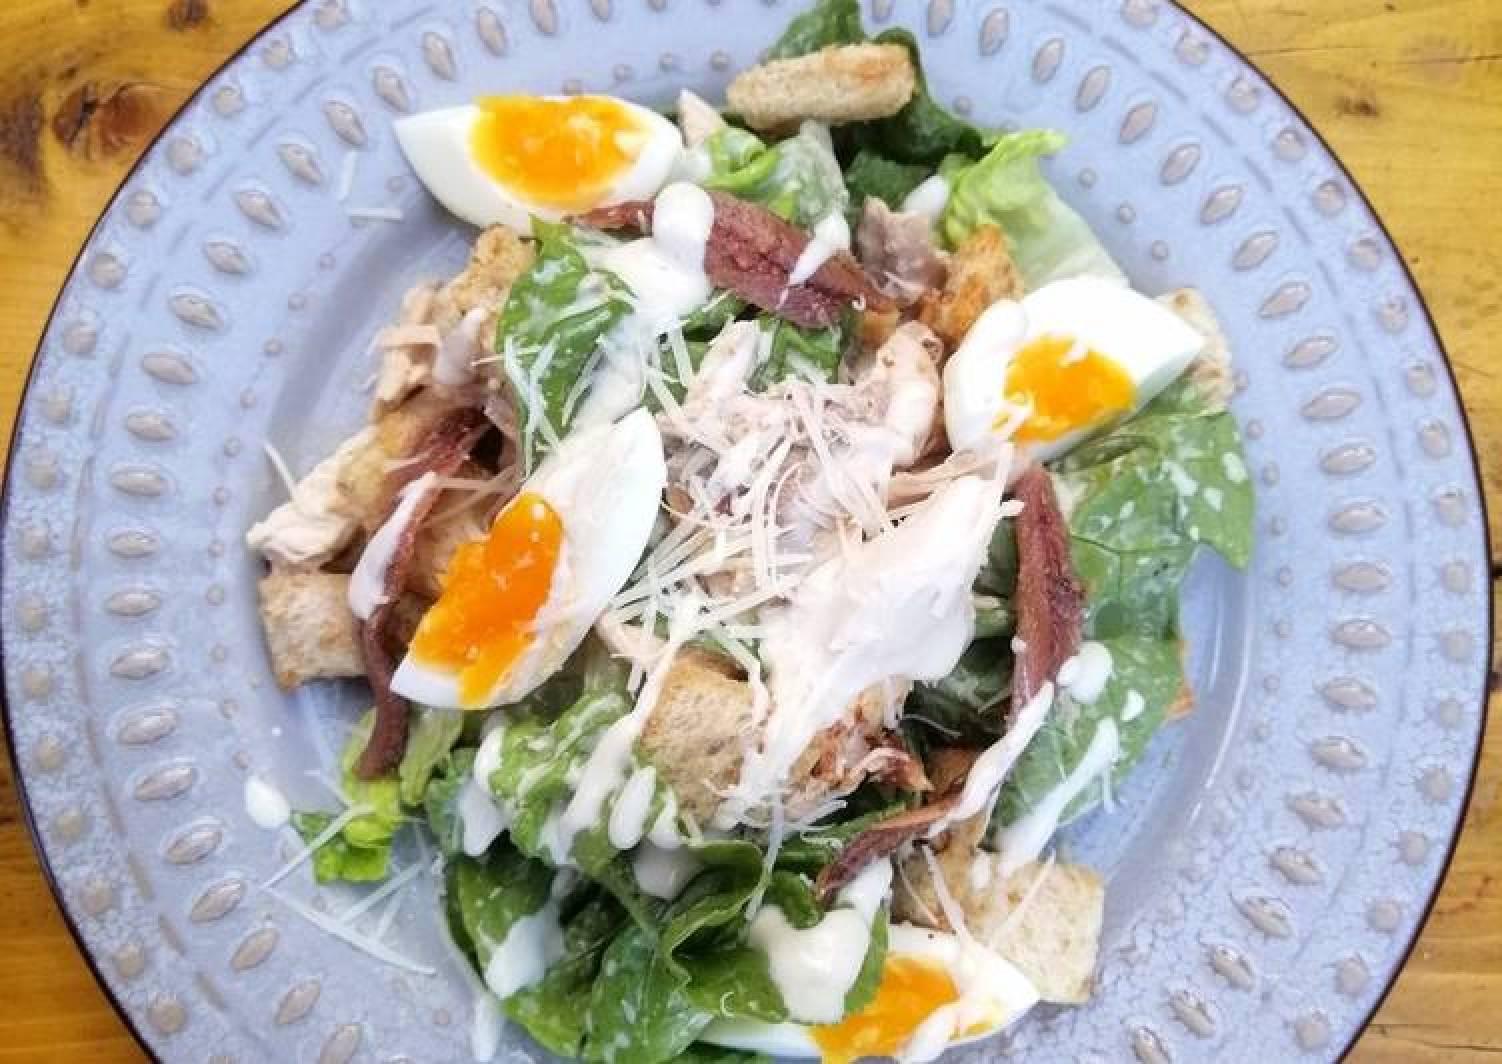 Beer can chicken Caesar salad skinny dressing version